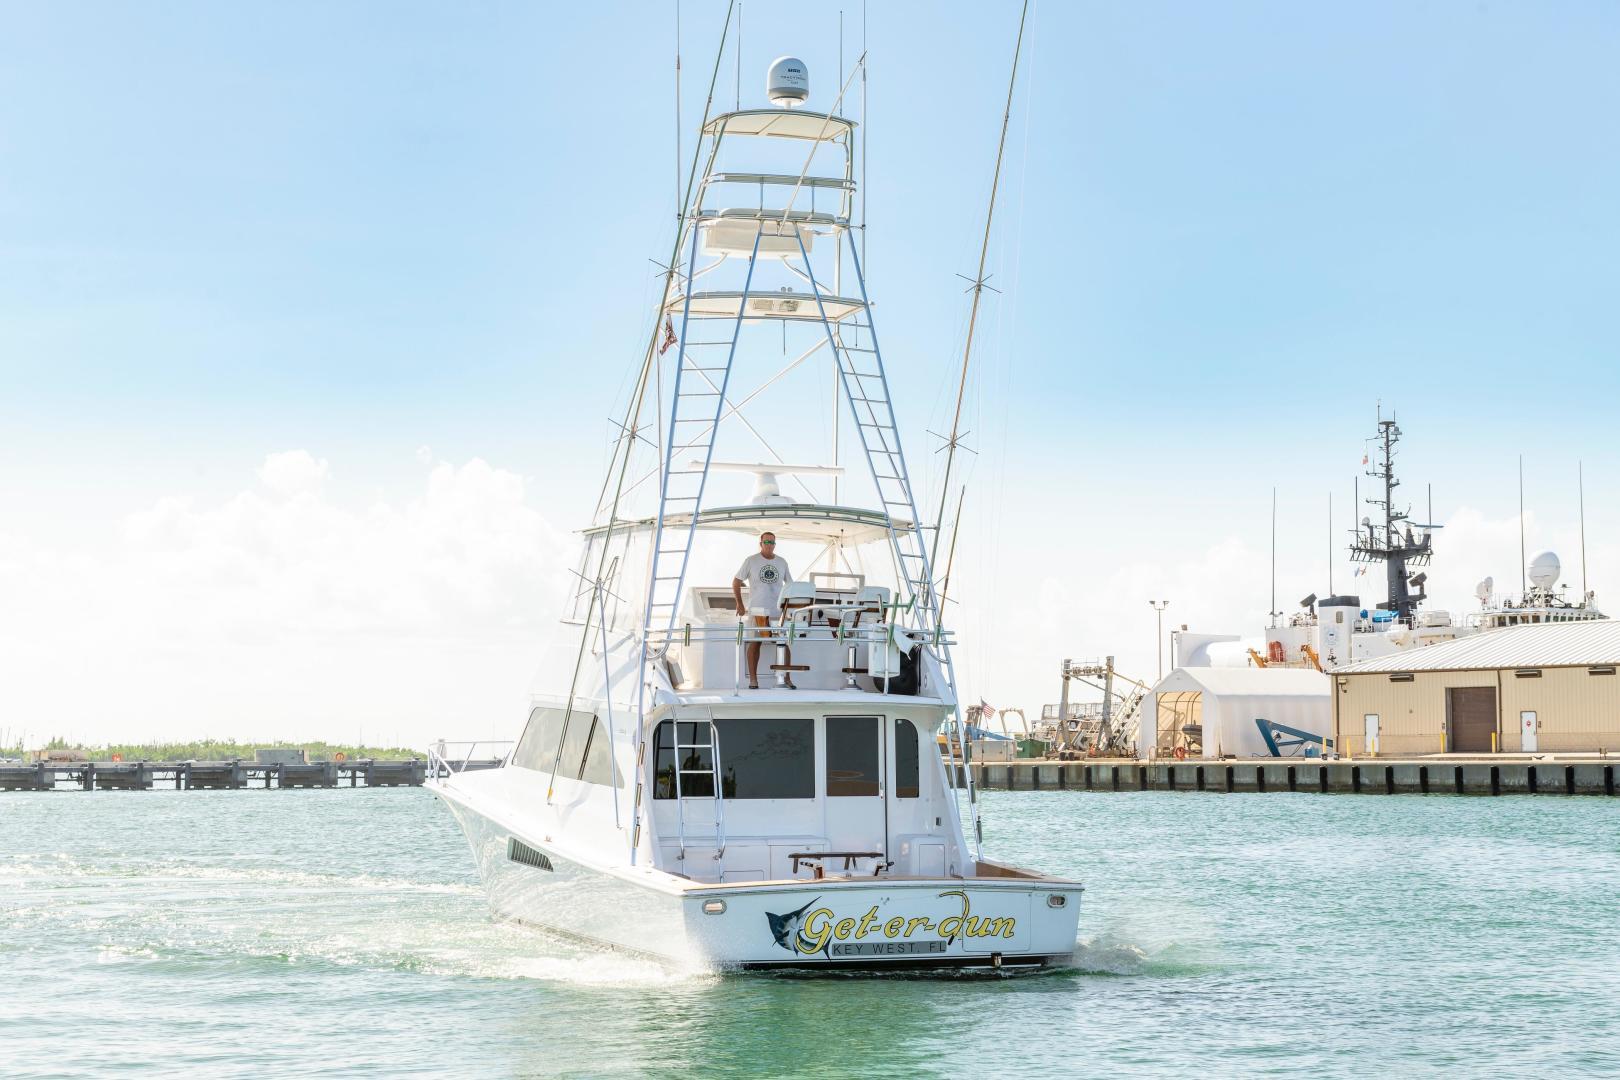 Viking-Convertible 2000-GET ER DONE Key West-Florida-United States-1480236 | Thumbnail